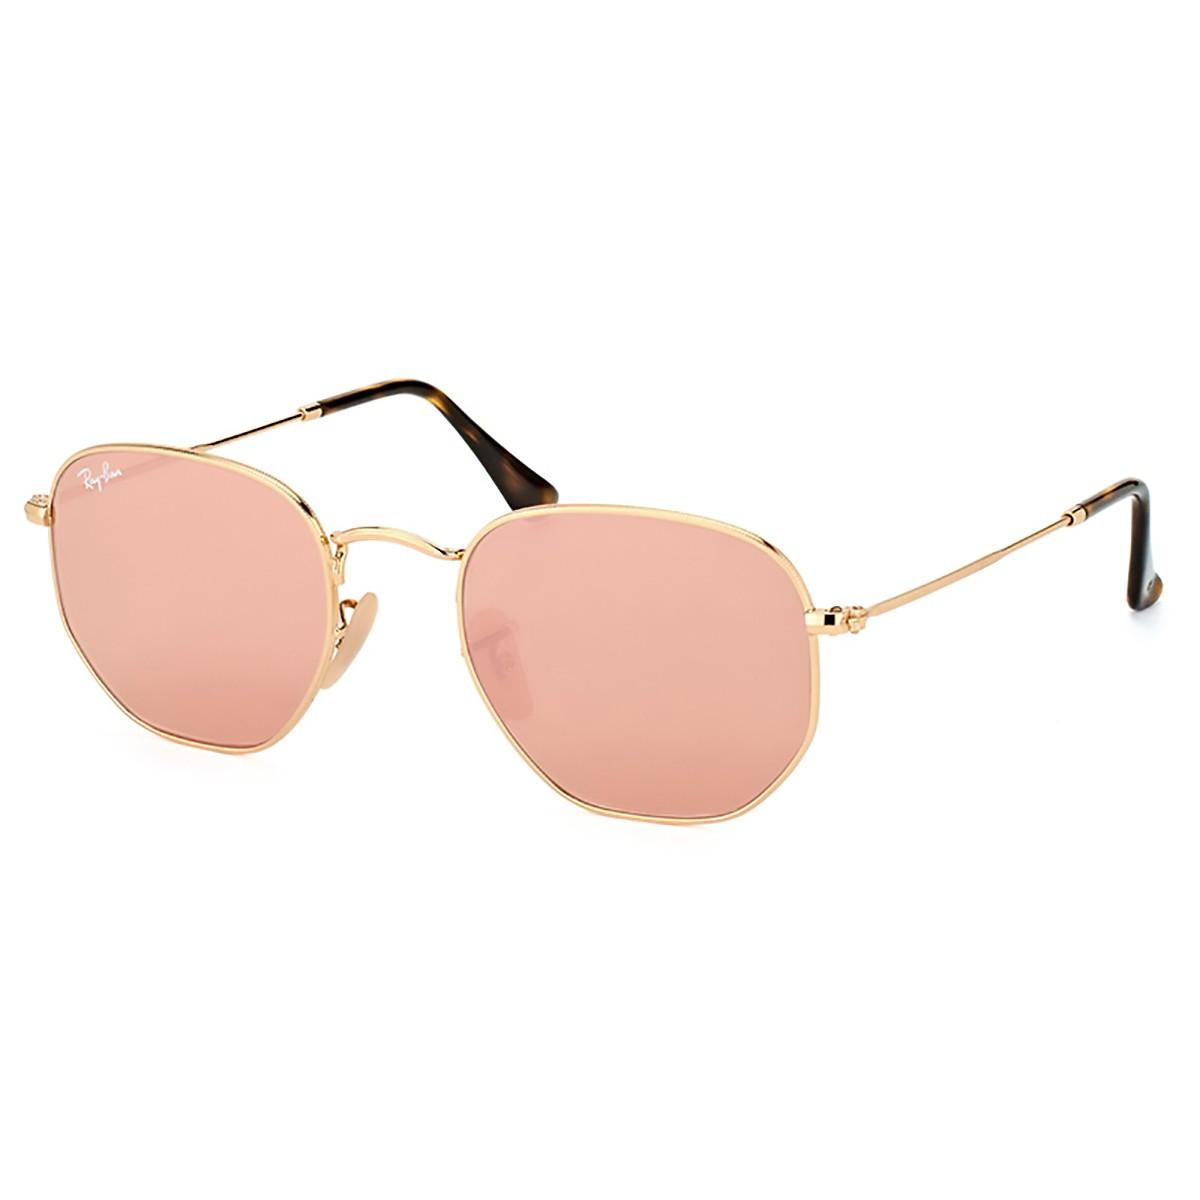 1bef102dd75cf Compre Óculos de Sol Ray Ban Hexagonal em 10X